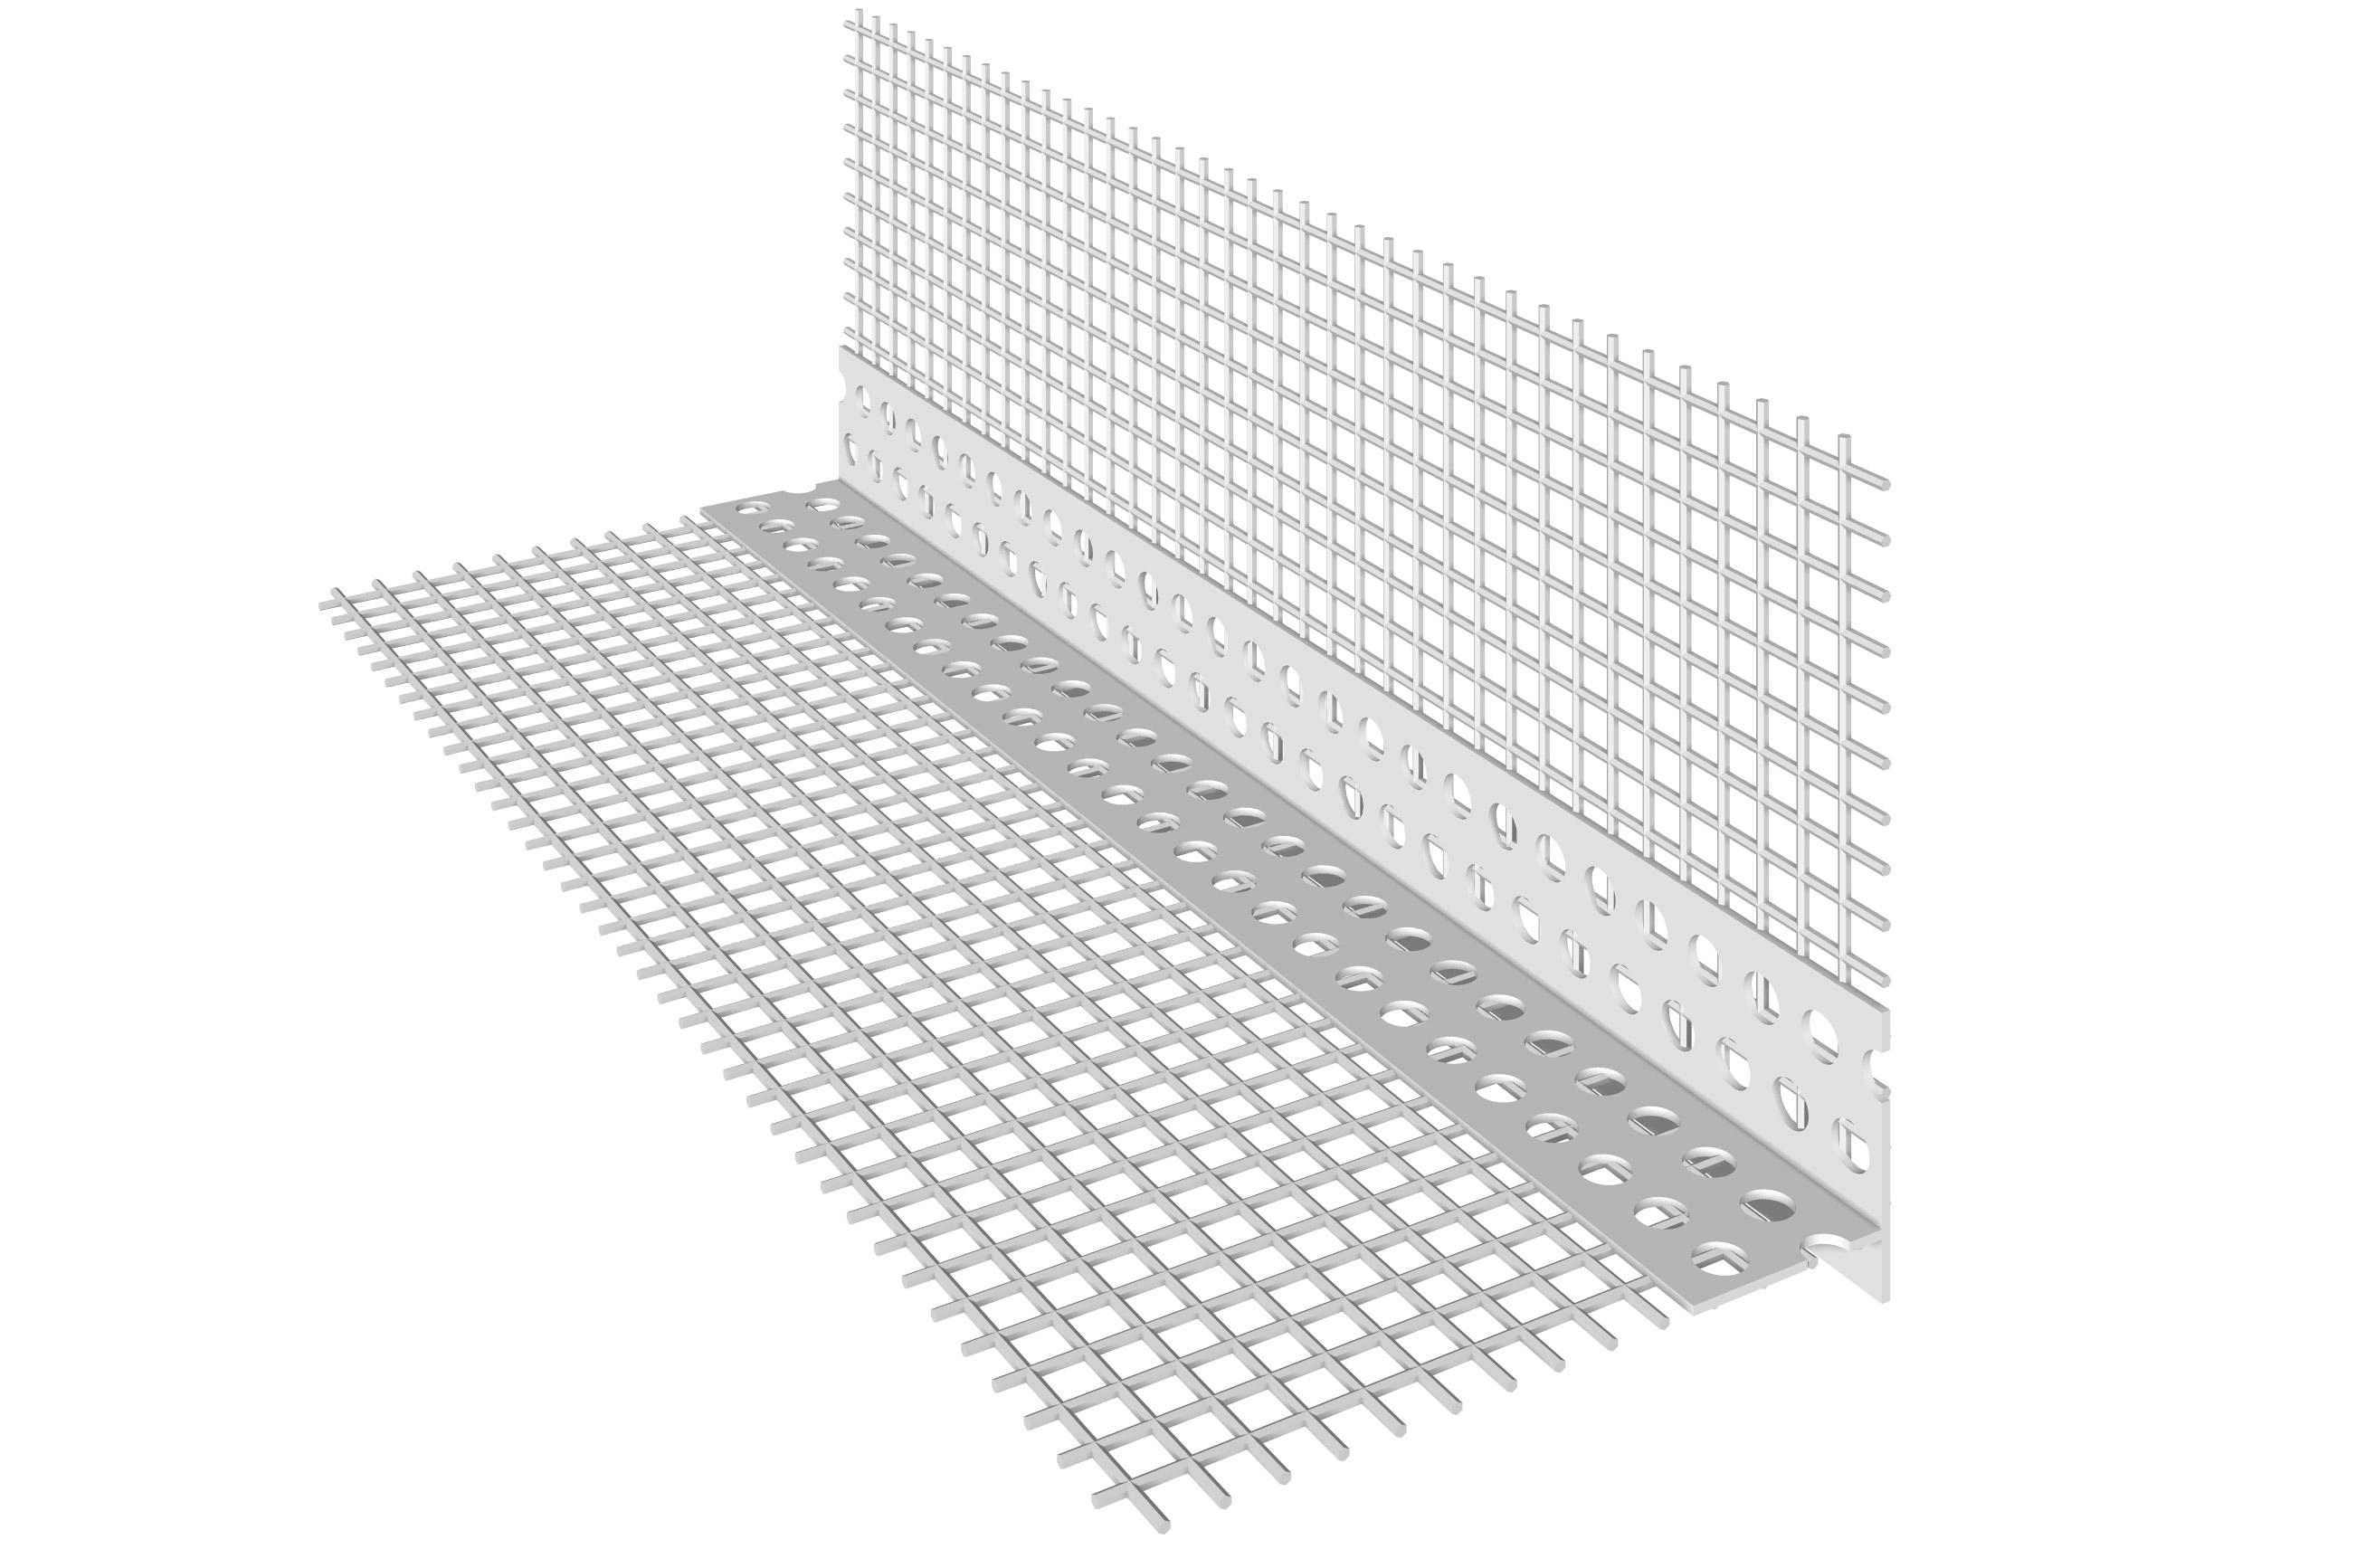 PARASPIGOLO IN PVC CON GOCCIOLATOIO VERTICALE: Paraspigolo in PVC con rete in fibra di vetro preincollata e gocciolatoio verticale